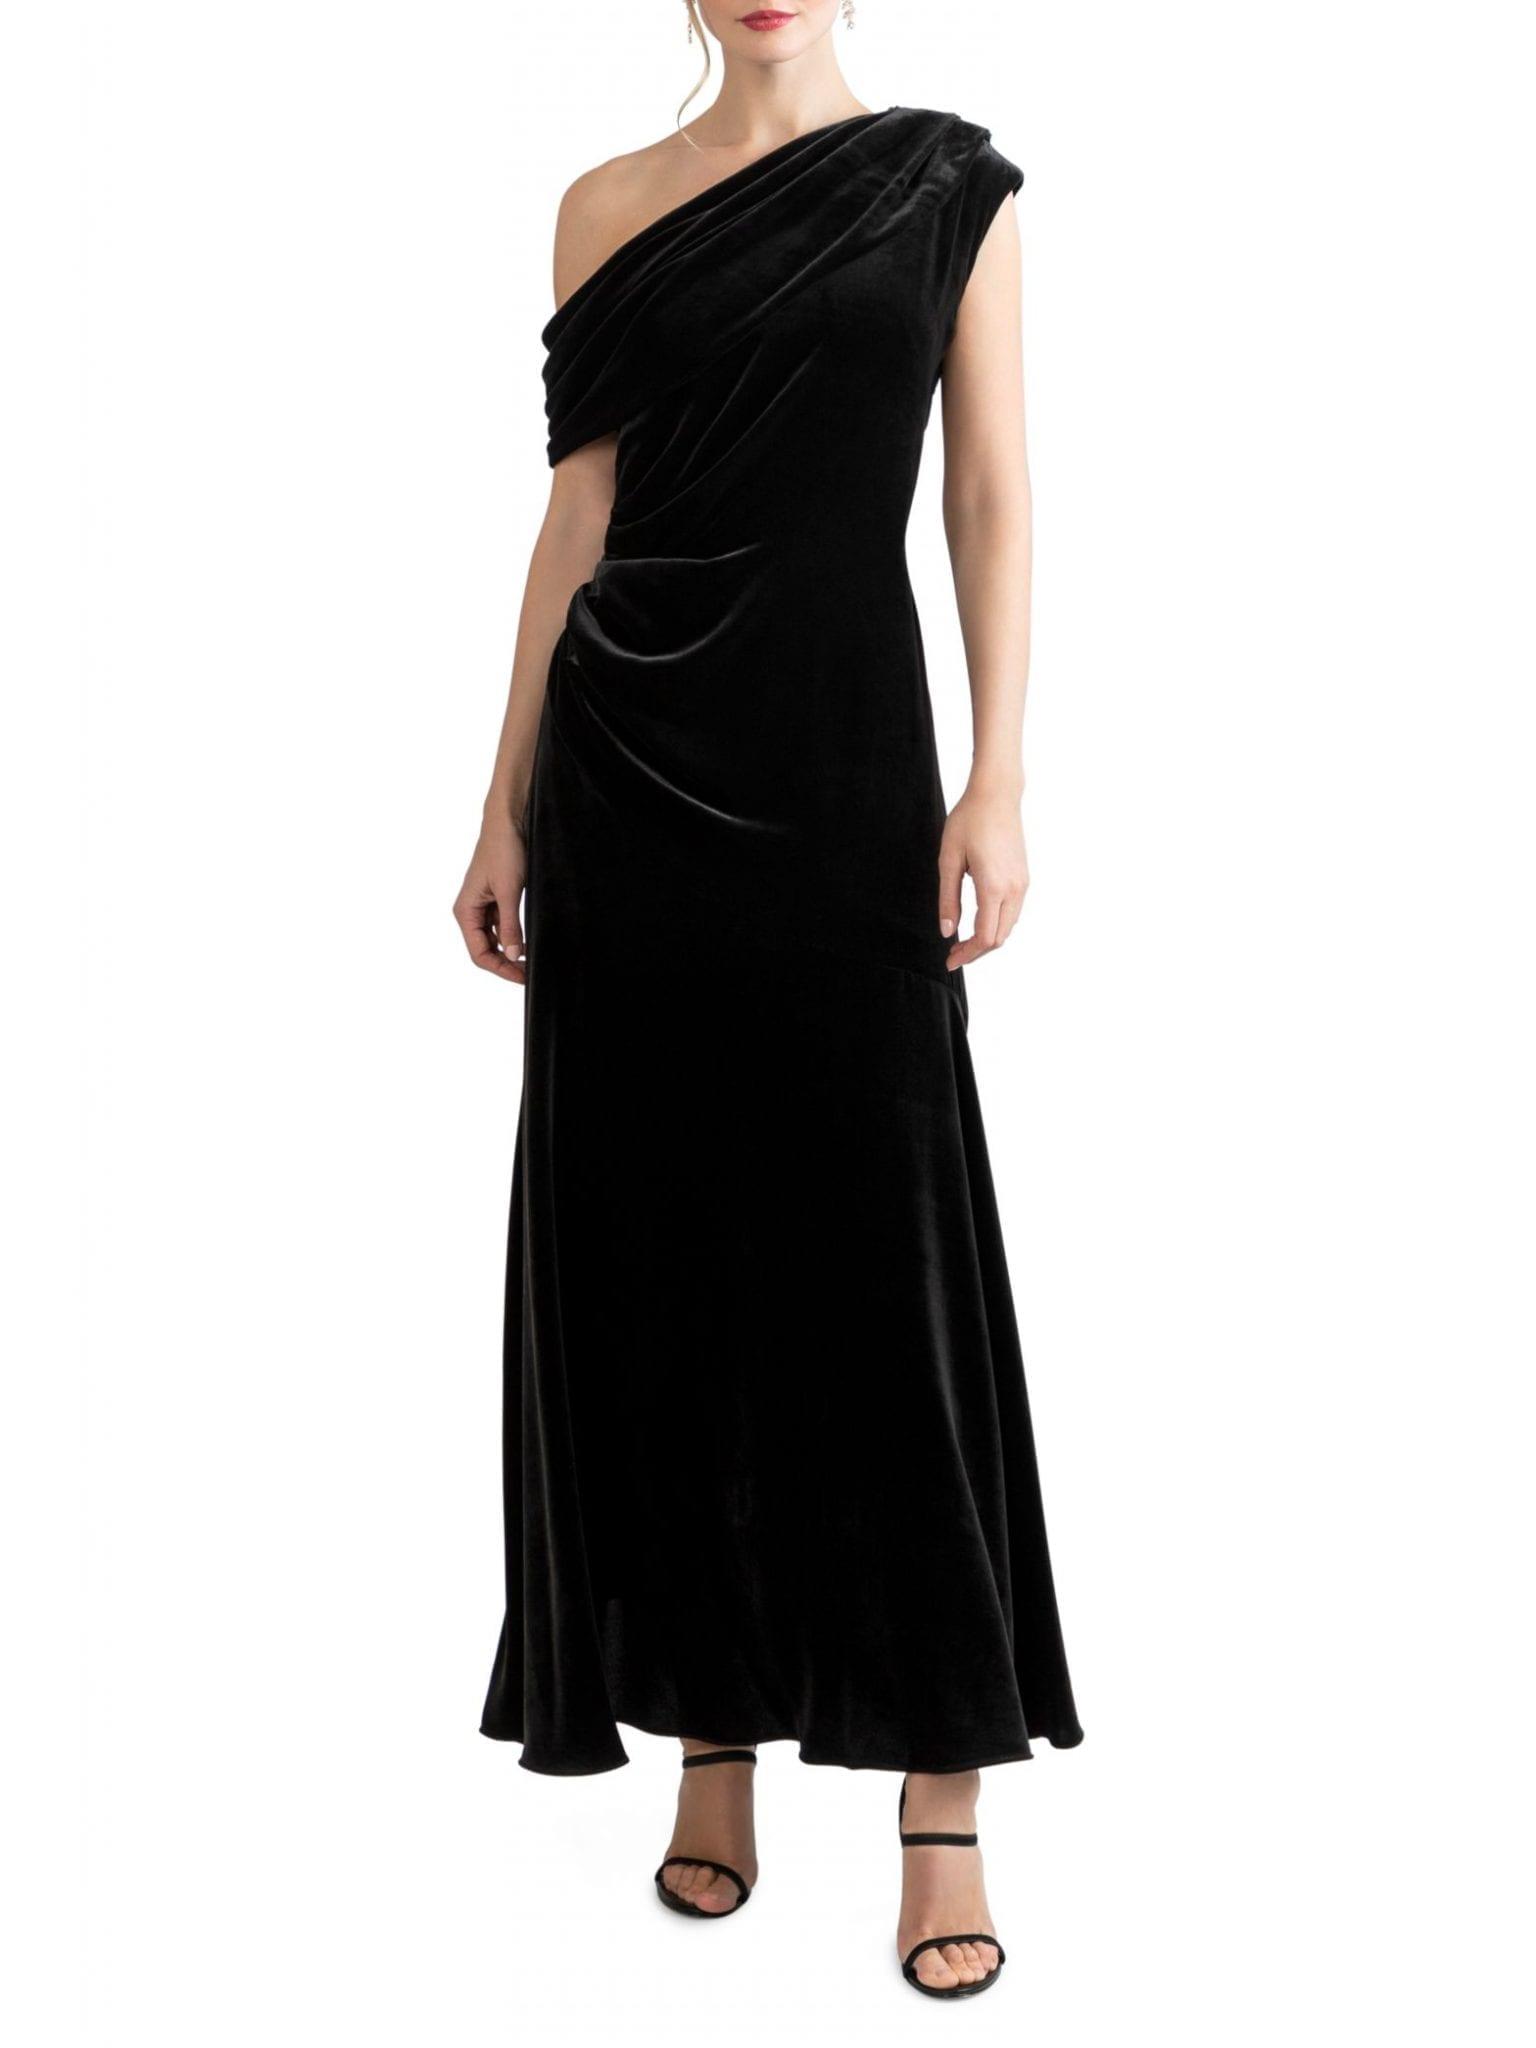 SHOSHANNA Goldie One-Shoulder Velvet Dress